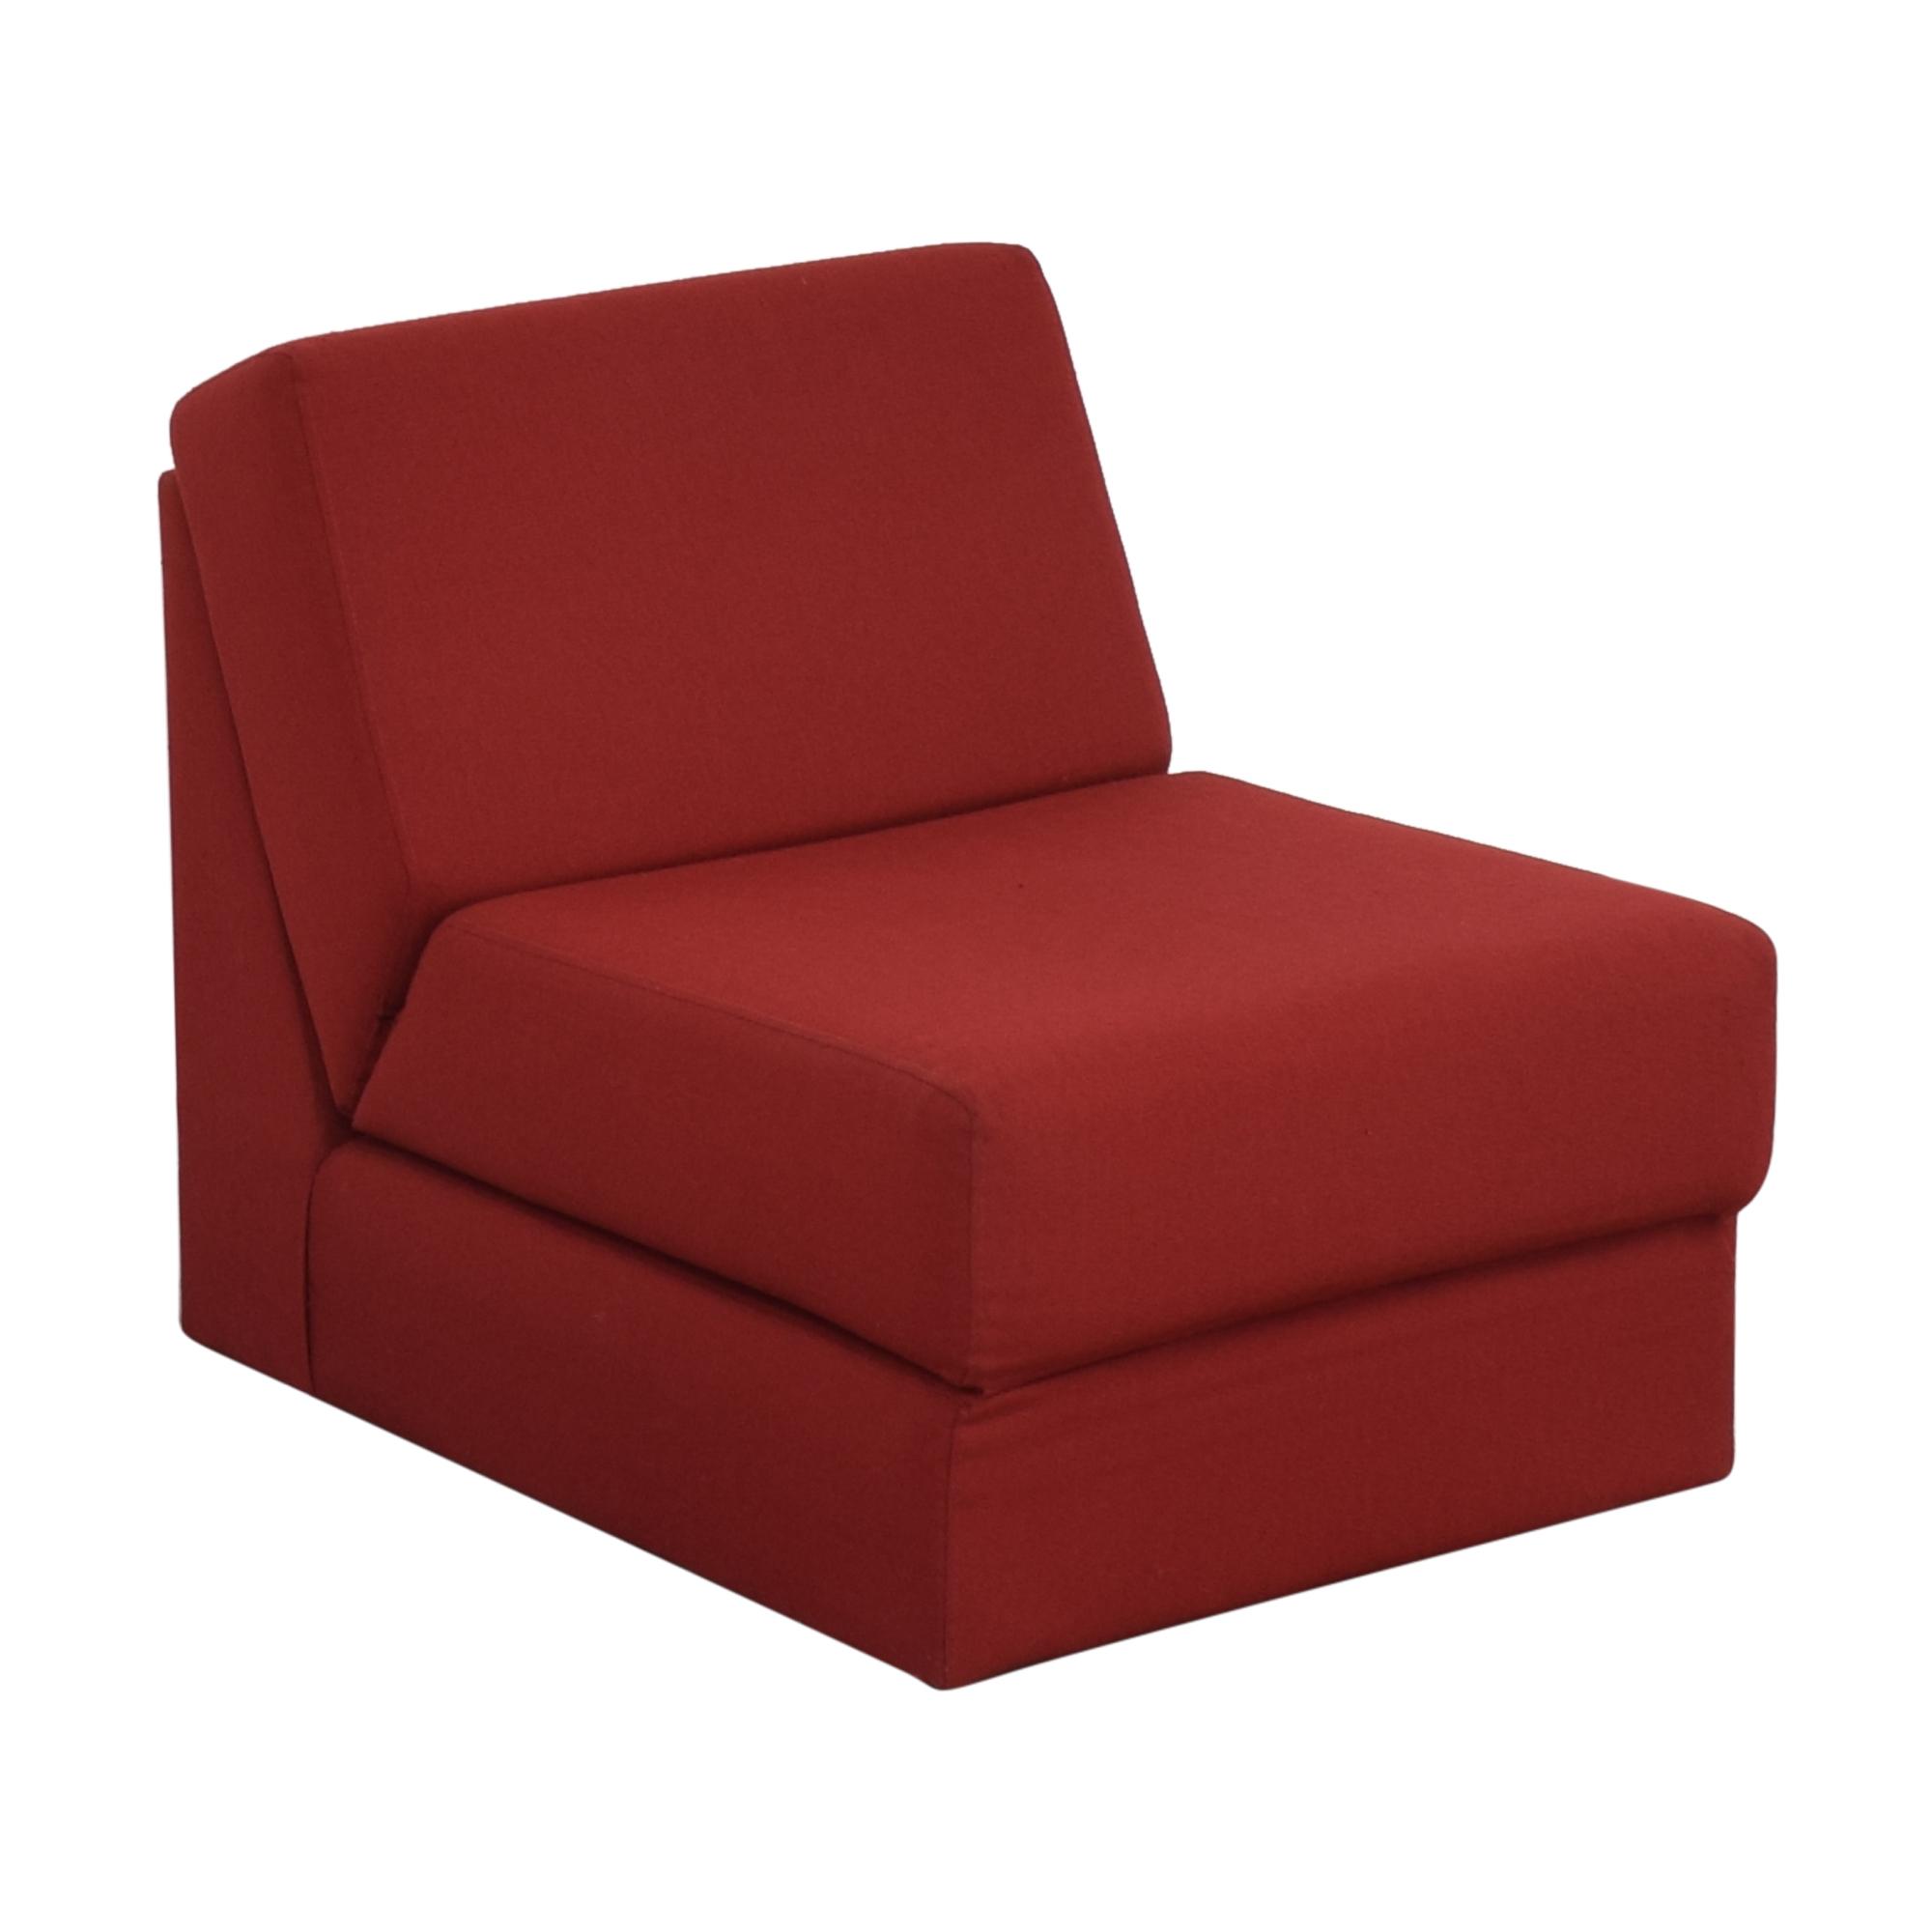 Lazzoni Lazzoni Mini Seat Packing Sofa Bed nyc